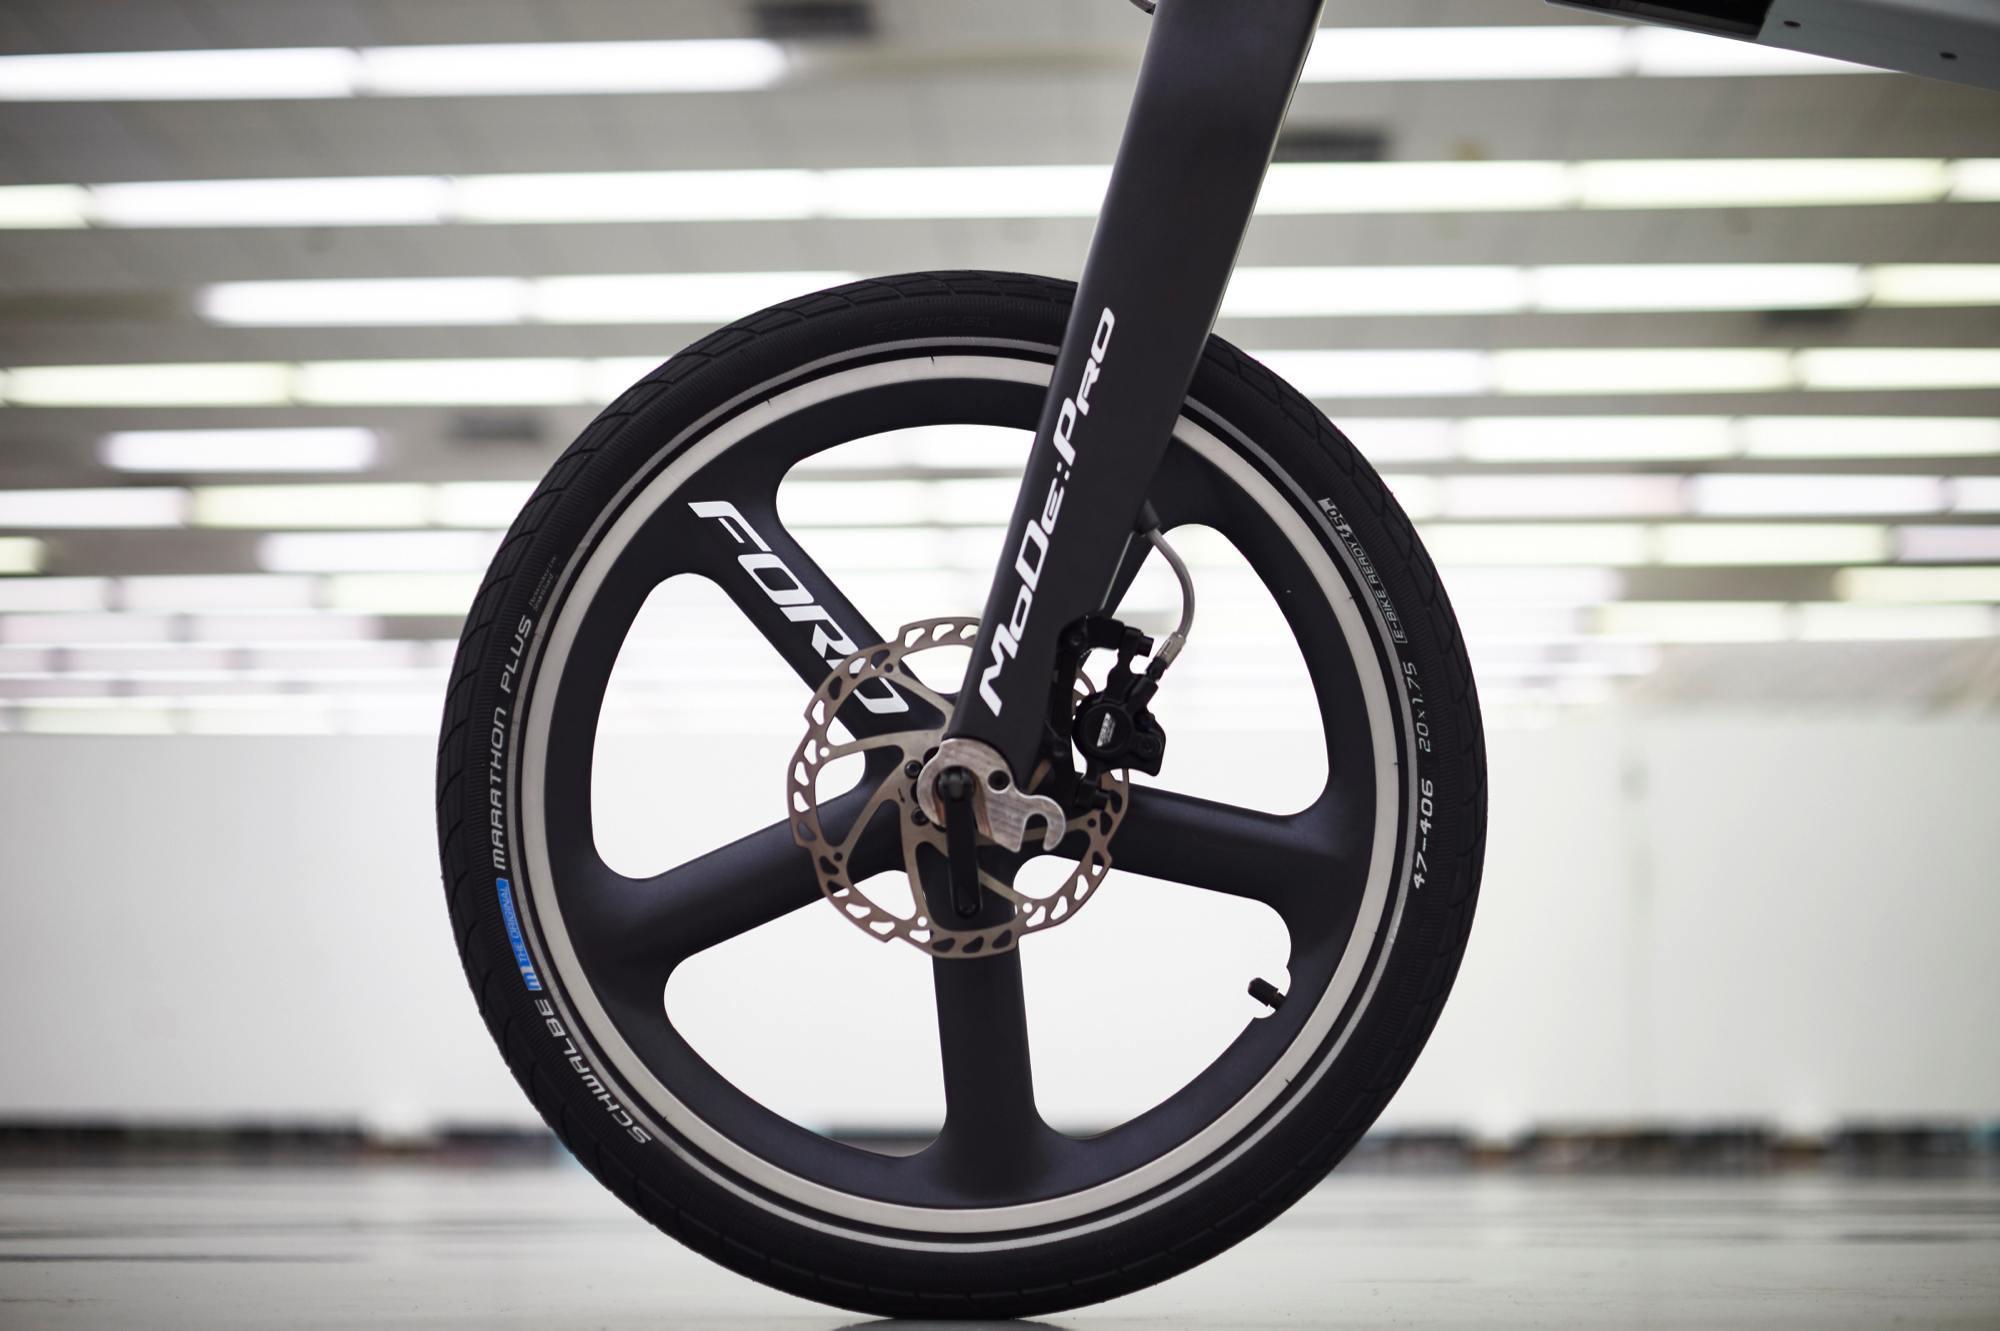 Foto de Ford Mode:Me y Mode:Pro, bicicletas eléctricas (12/16)